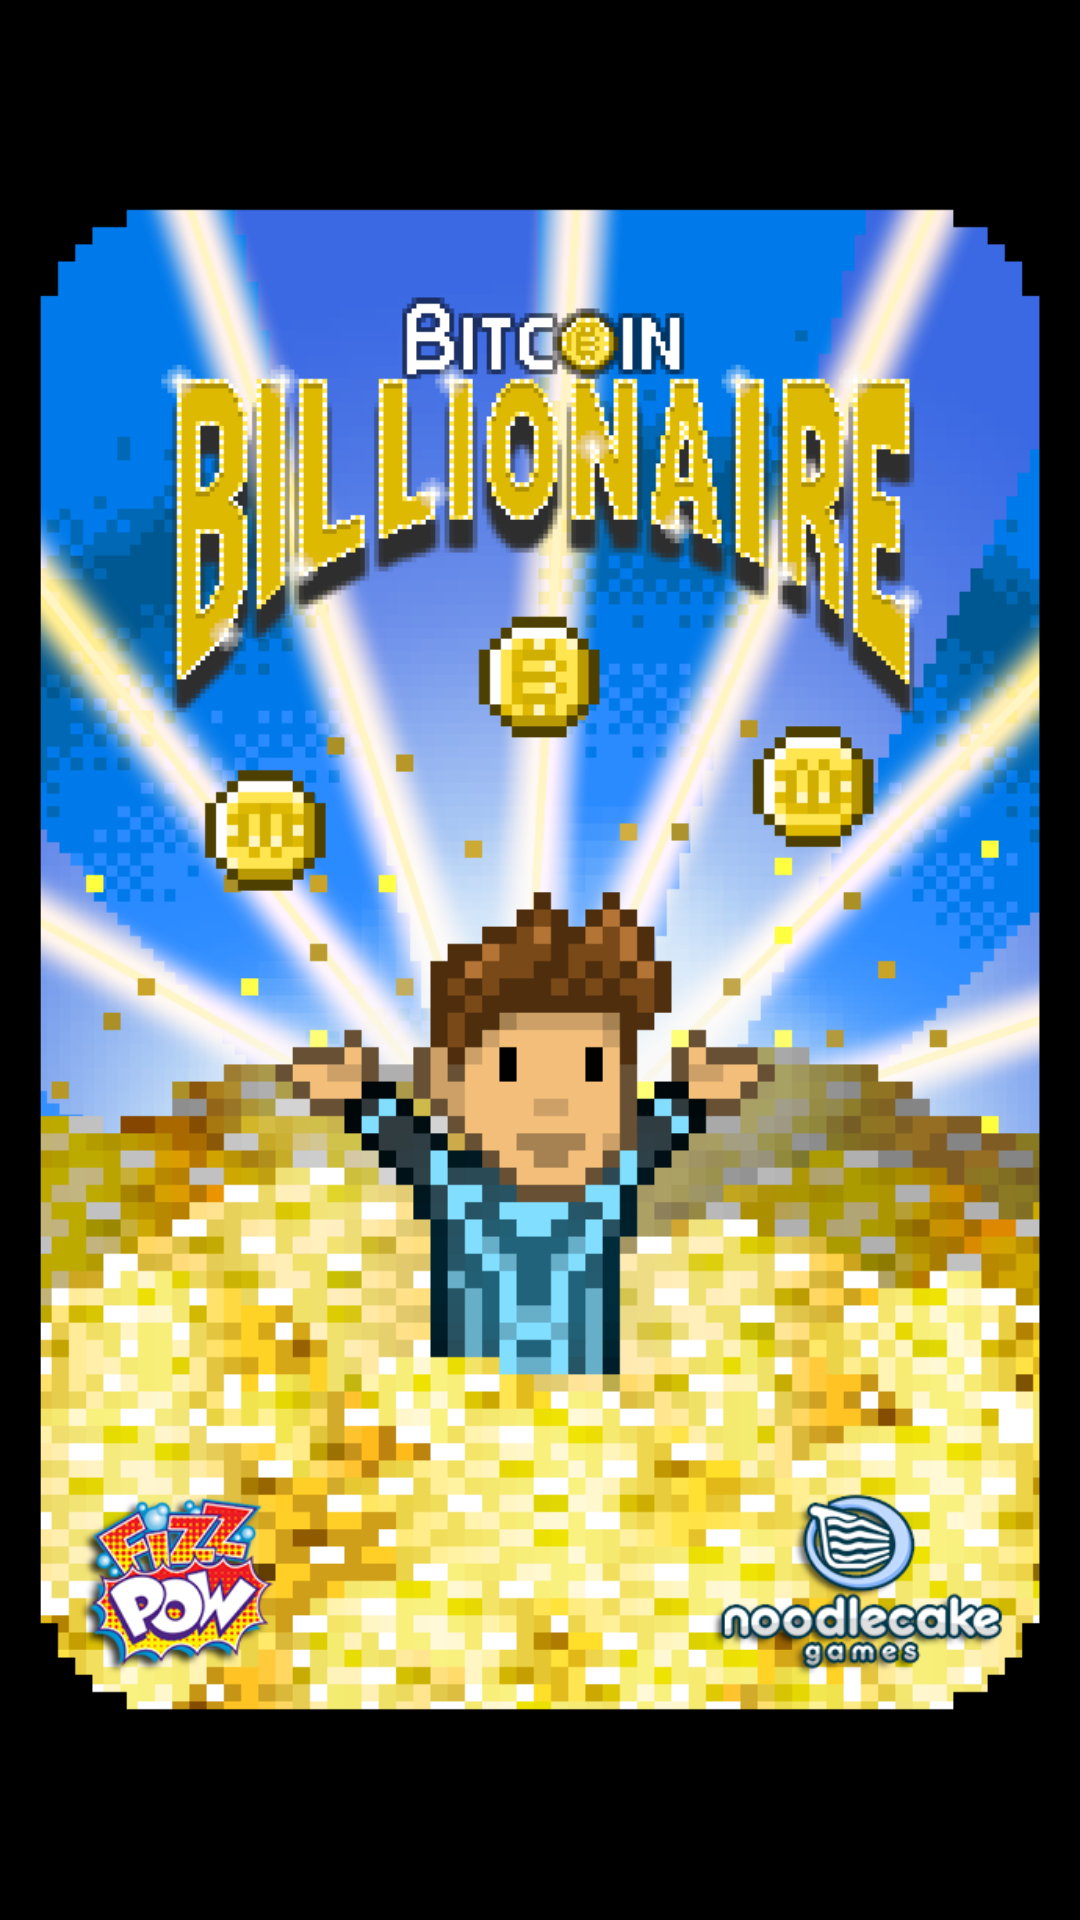 parsisiųsti bitcoin bilionaire